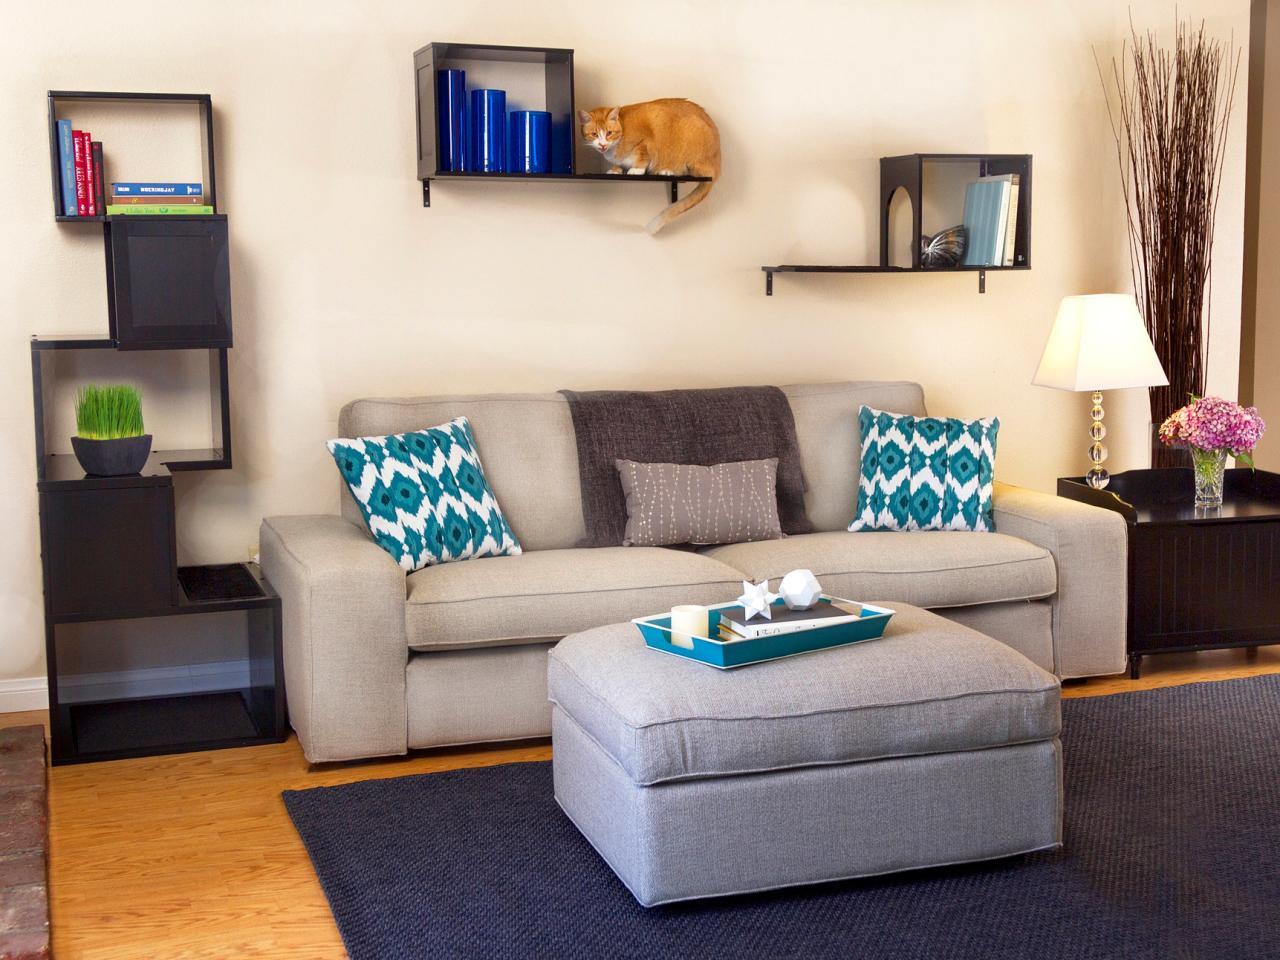 Design Ideas Your Cat Will Love HGTVs Decorating Design Blog HGTV